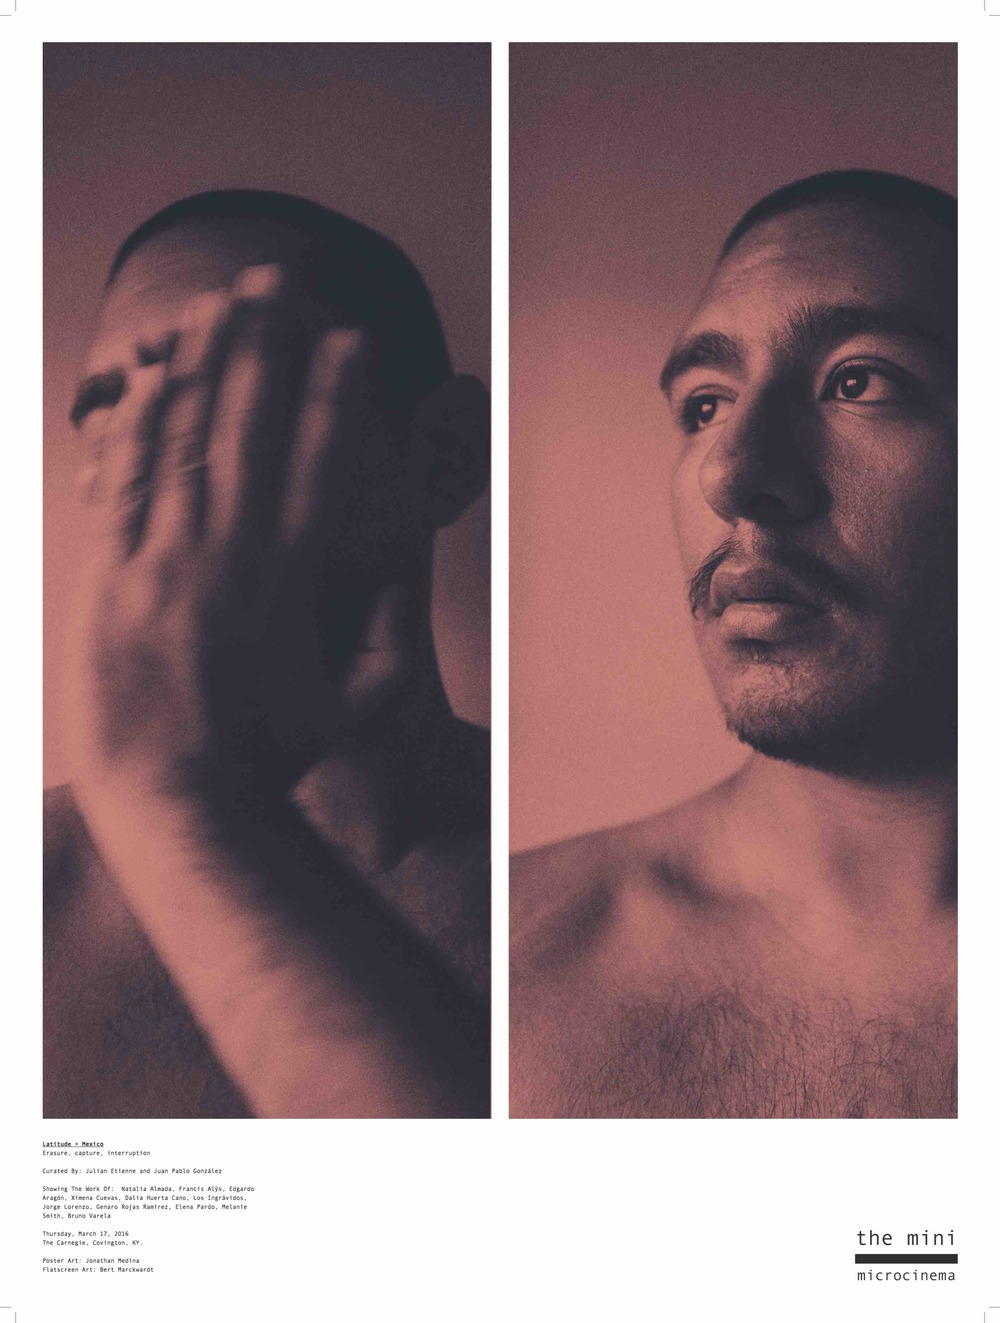 #012 - Jonathan Medina